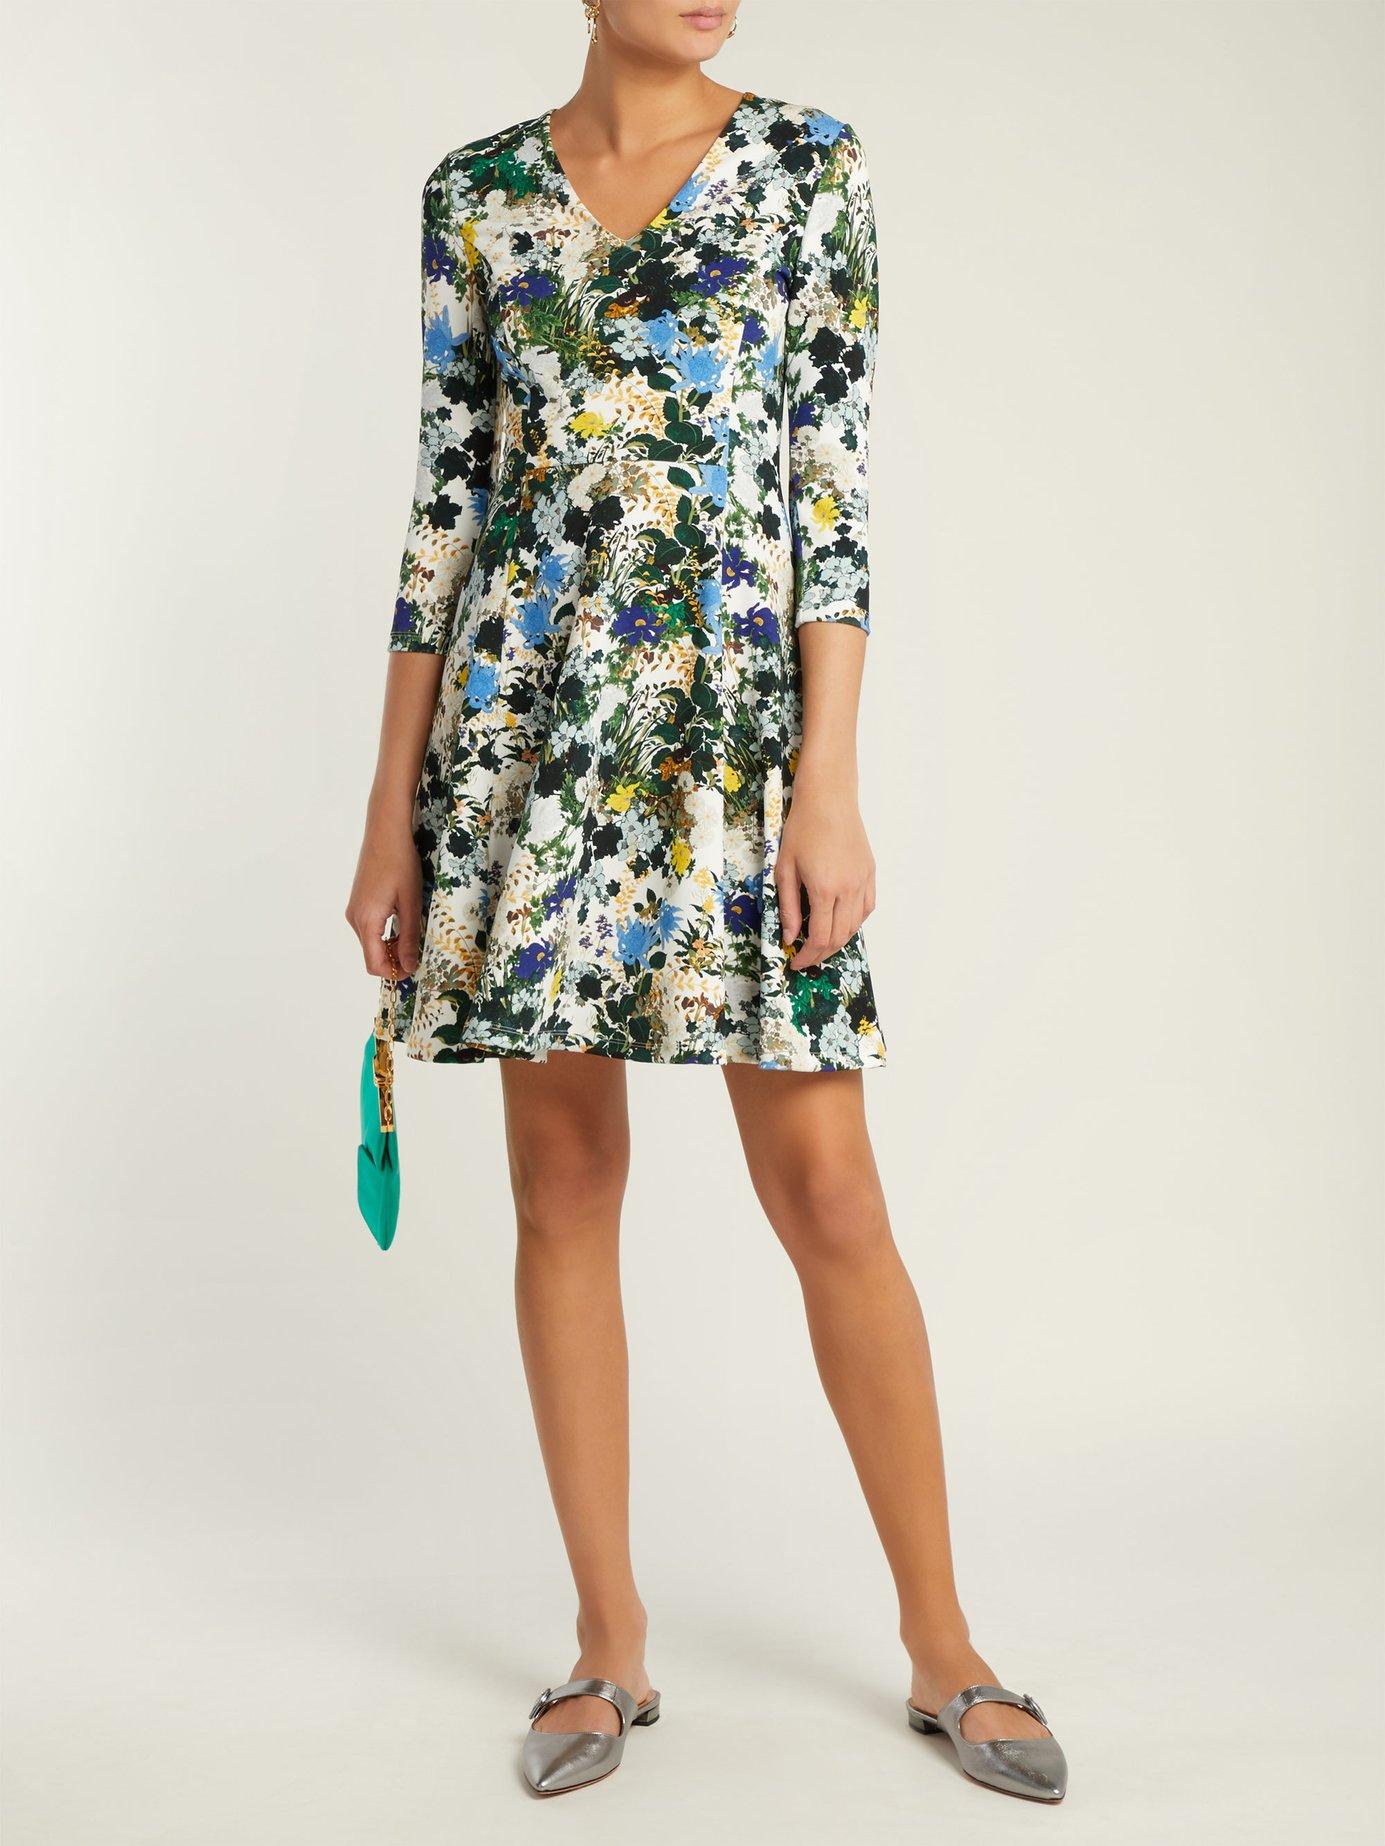 Domitilla Mariko Meadow-print dress by Erdem